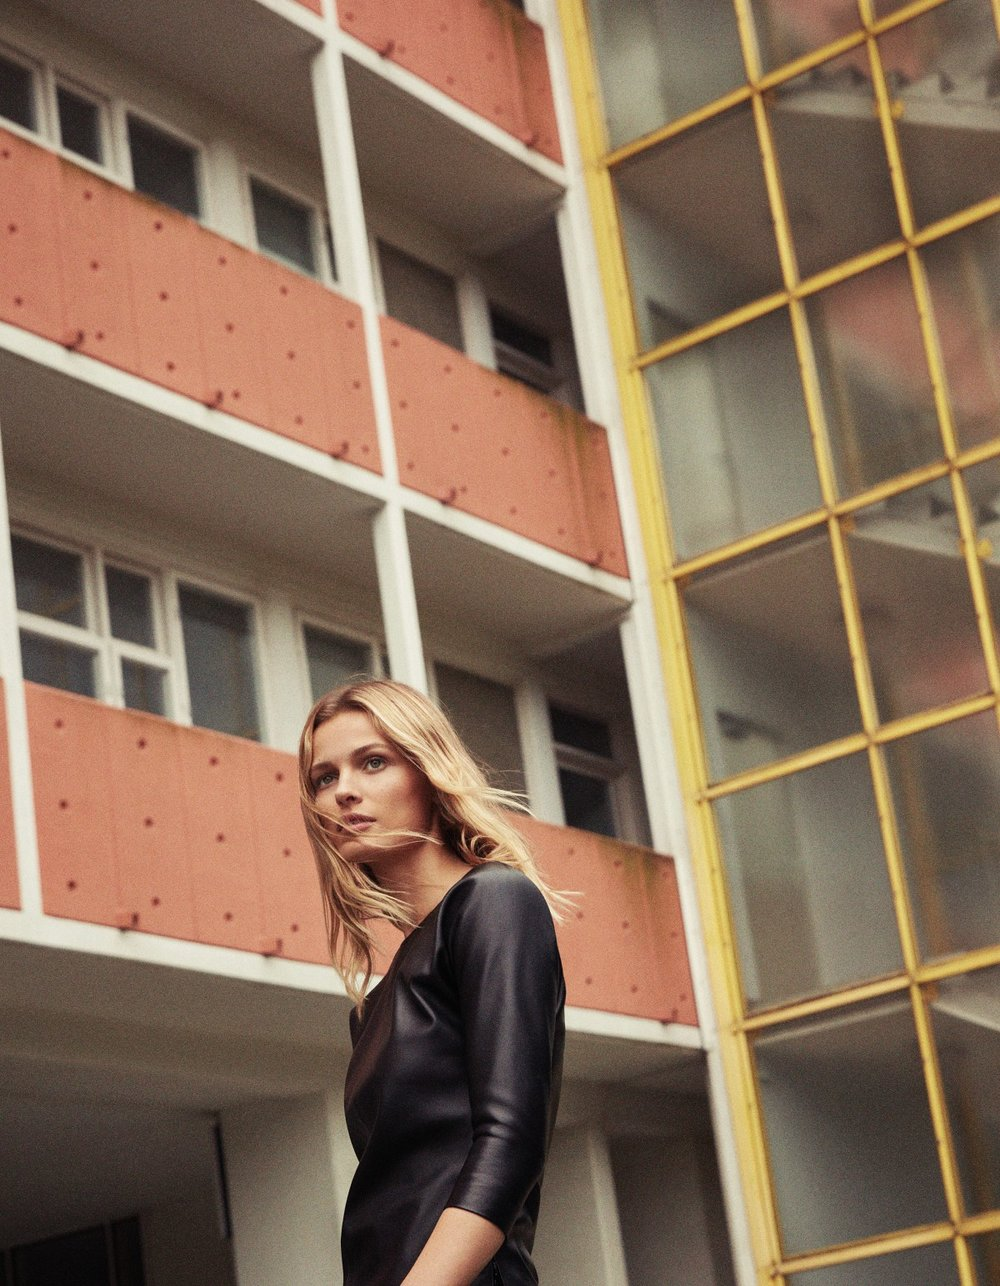 Edita Vilkeviciute by Marcus Ohlsson for S Moda El Pais (3).jpg